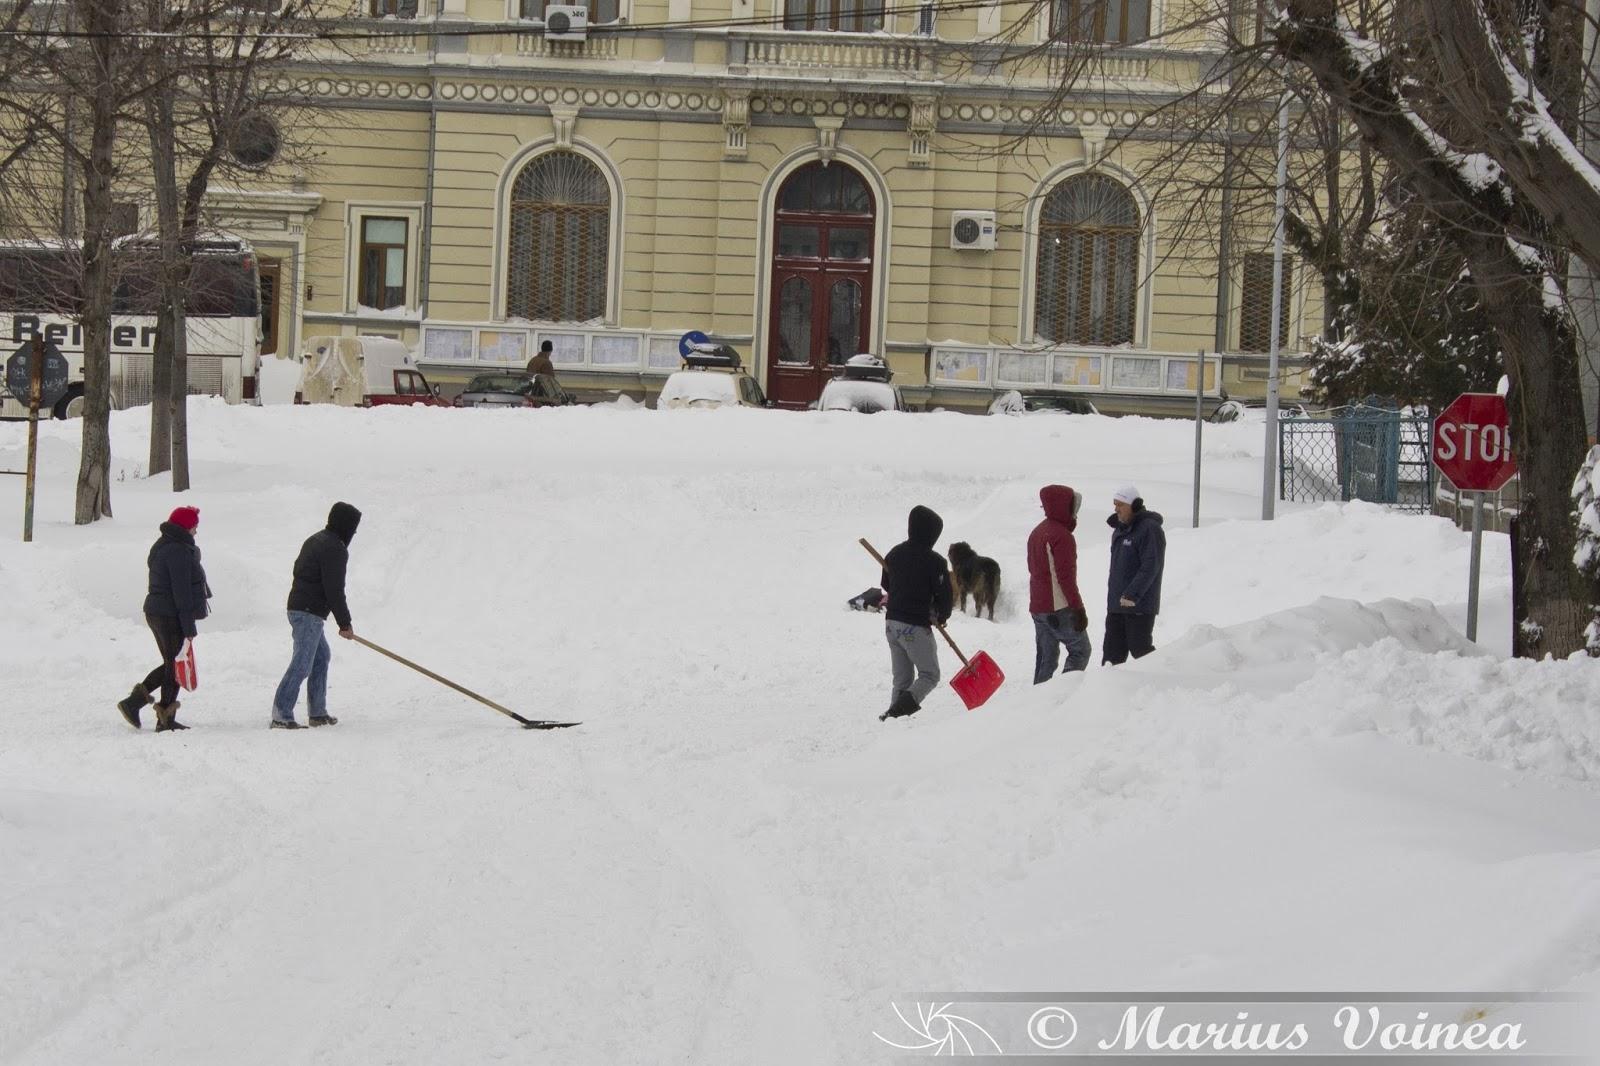 iarna la ramnicu sarat, 2014 foto 7